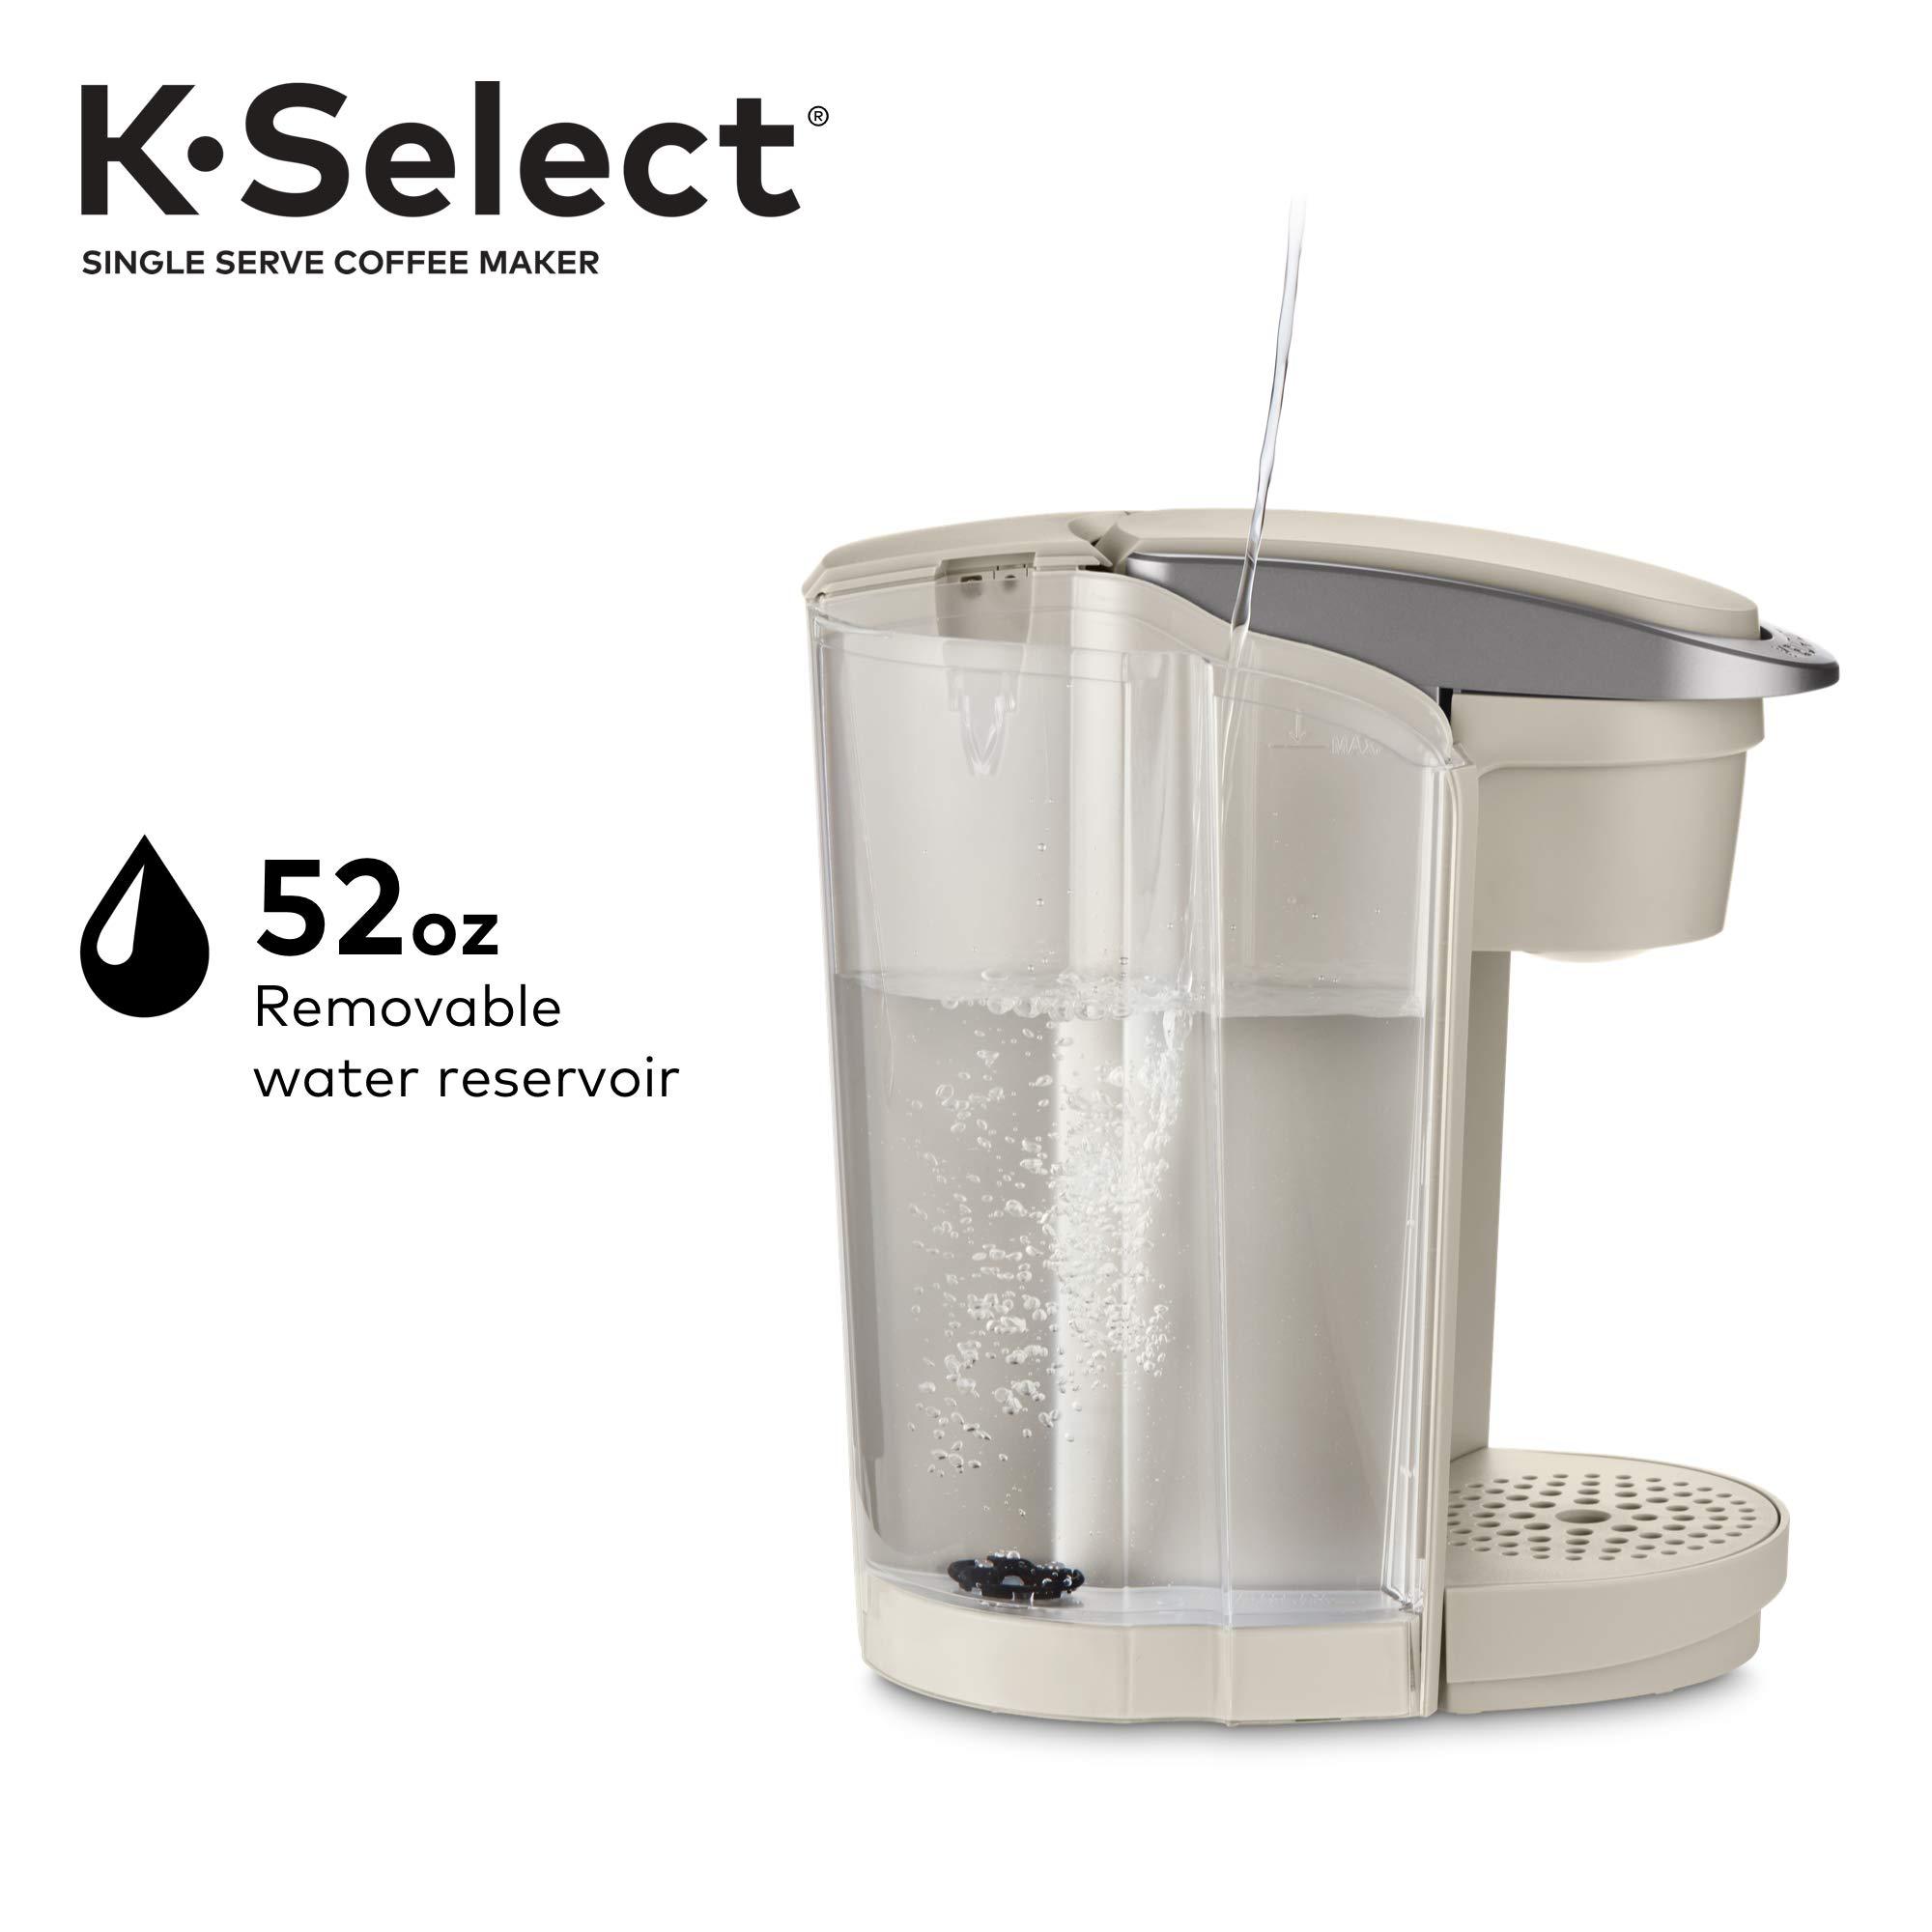 Keurig K-Select Single-Serve K-Cup Pod Coffee Maker, Sandstone by Keurig (Image #3)